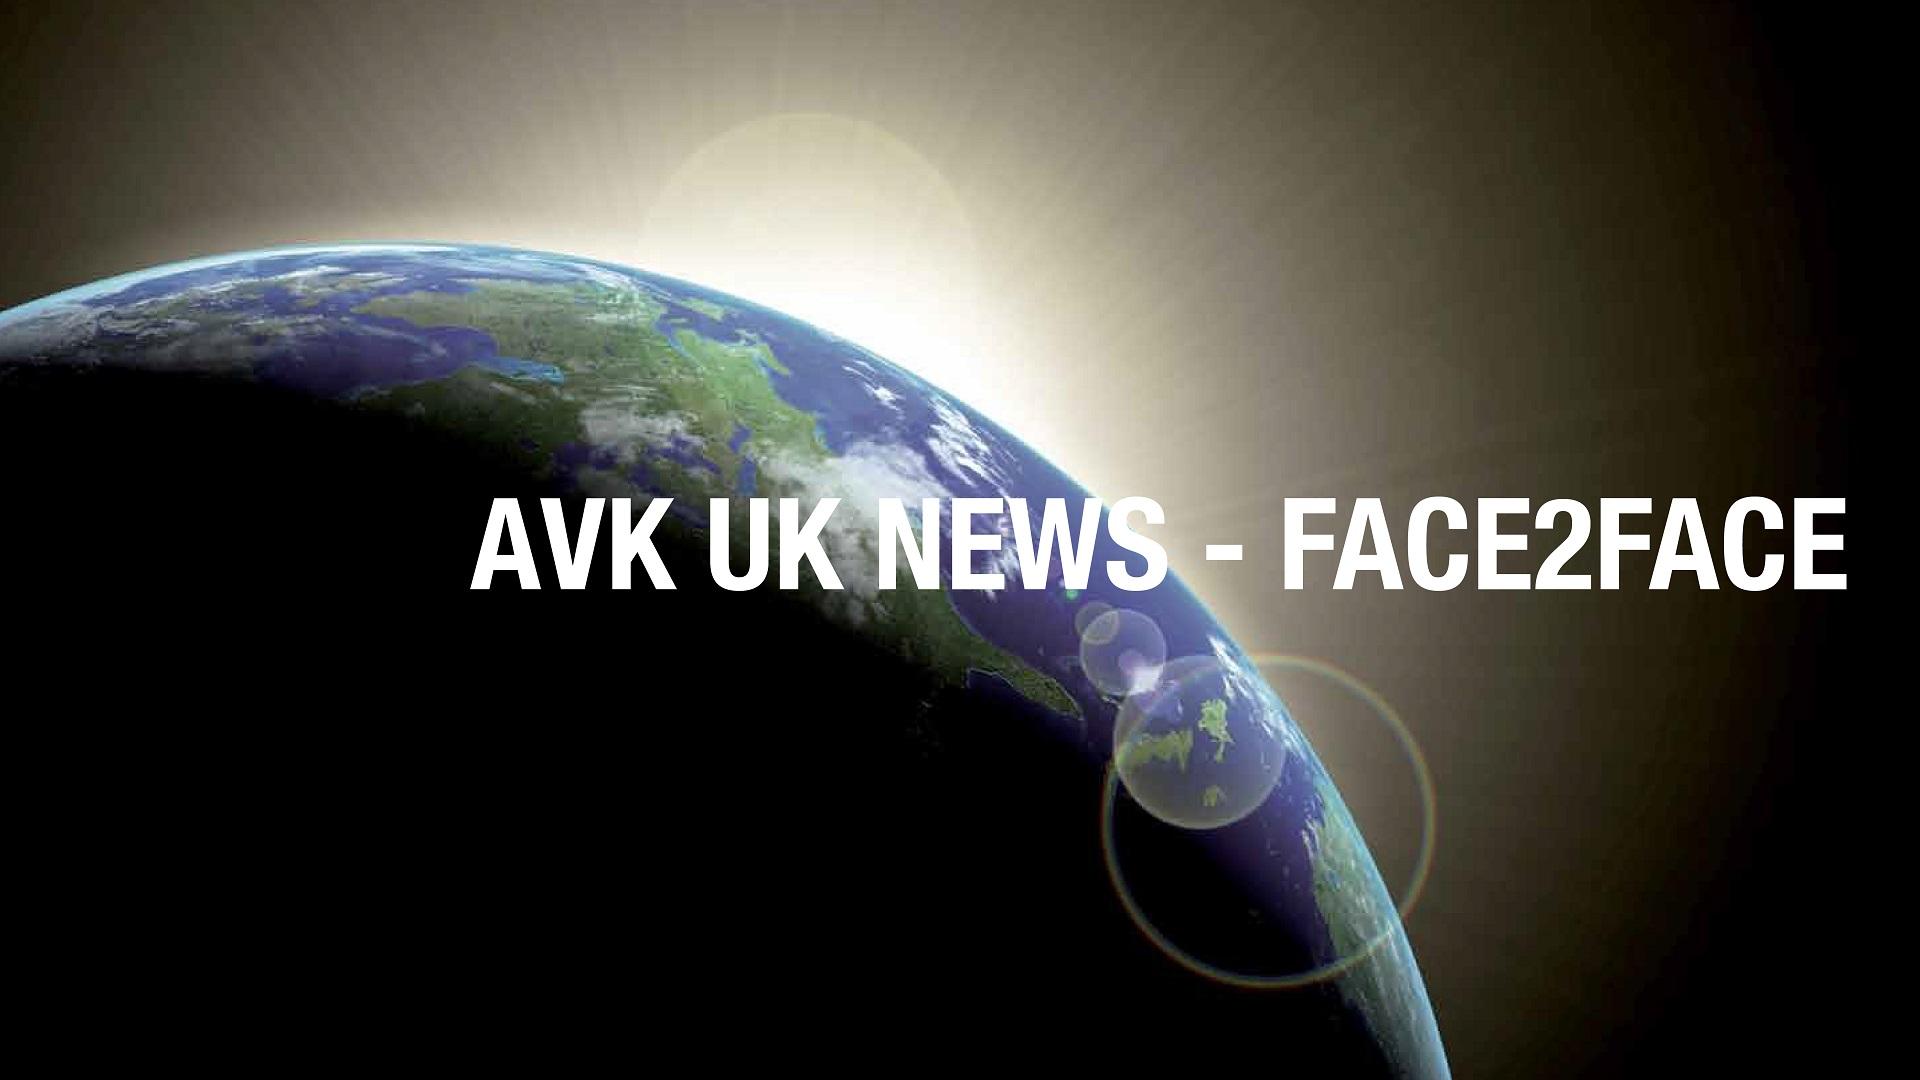 AVK UK Face 2 Face news